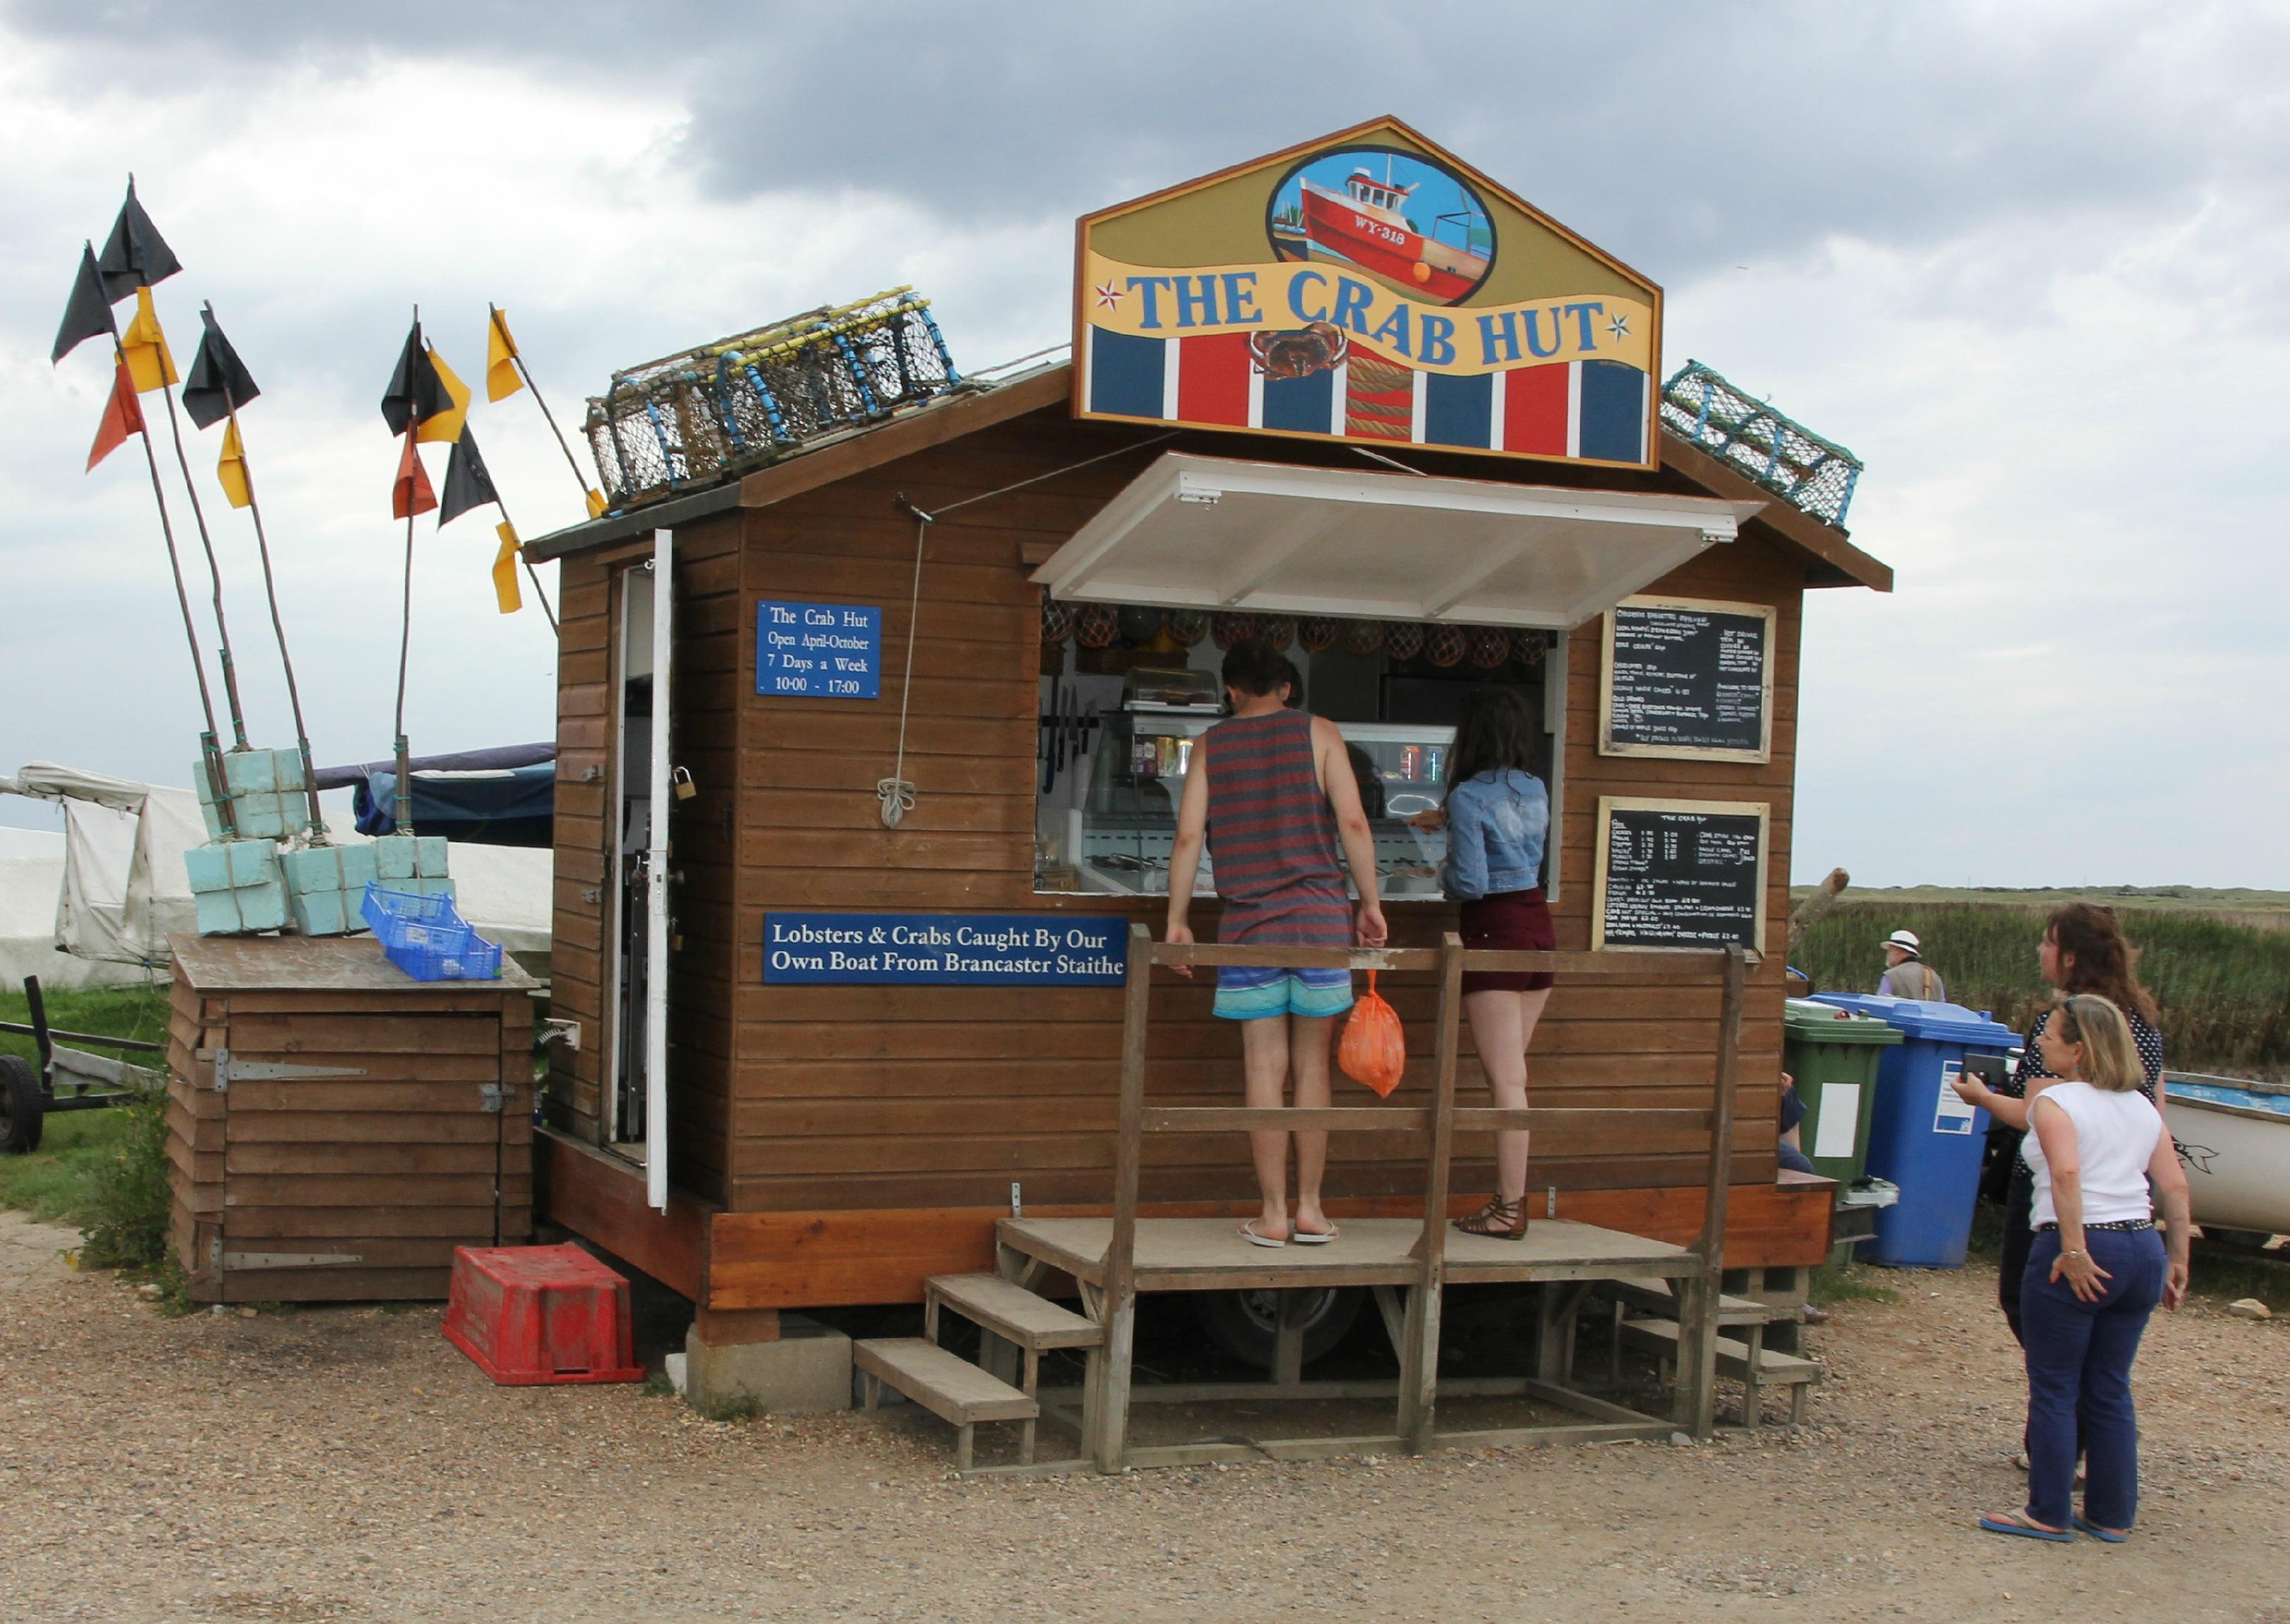 The Crab Hut Brancaster Staithe